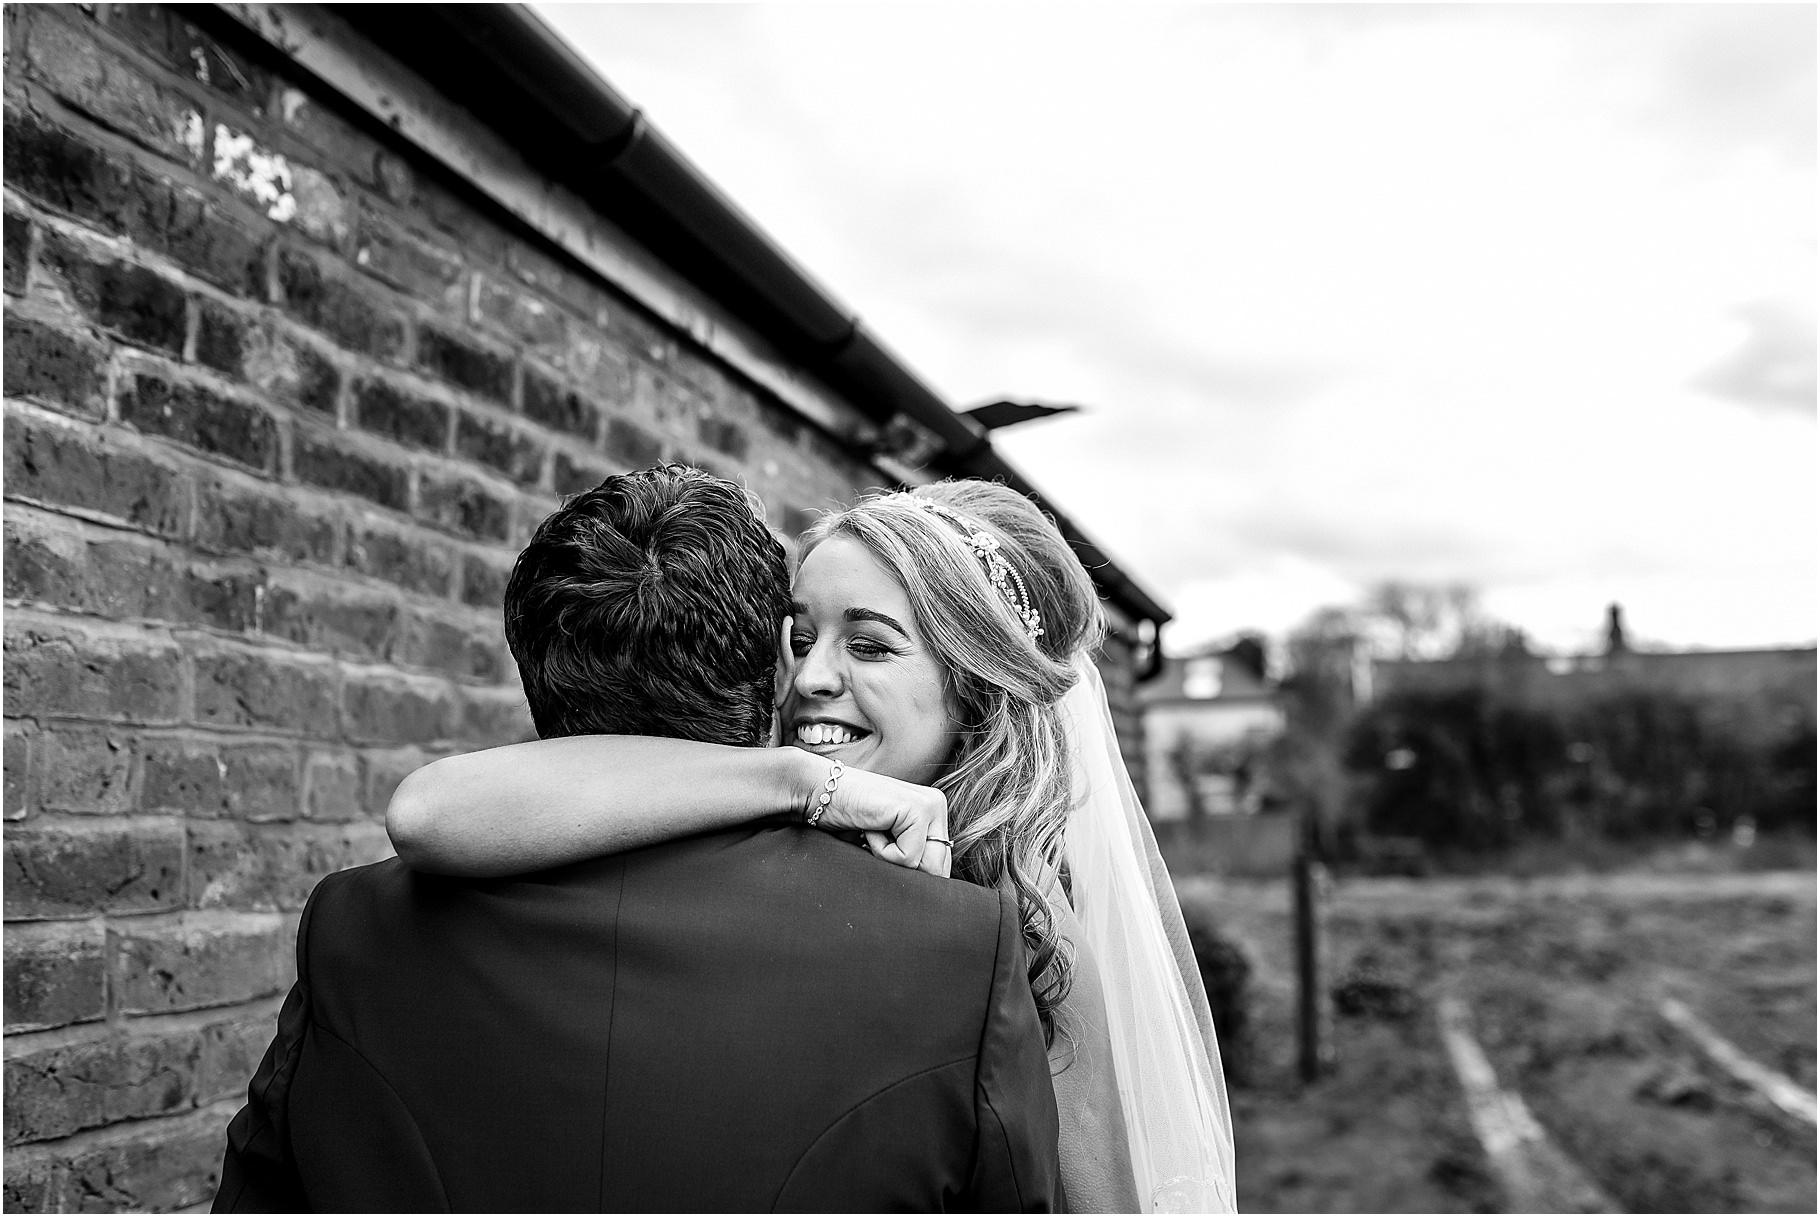 dan-wootton-photography-2017-weddings-068.jpg